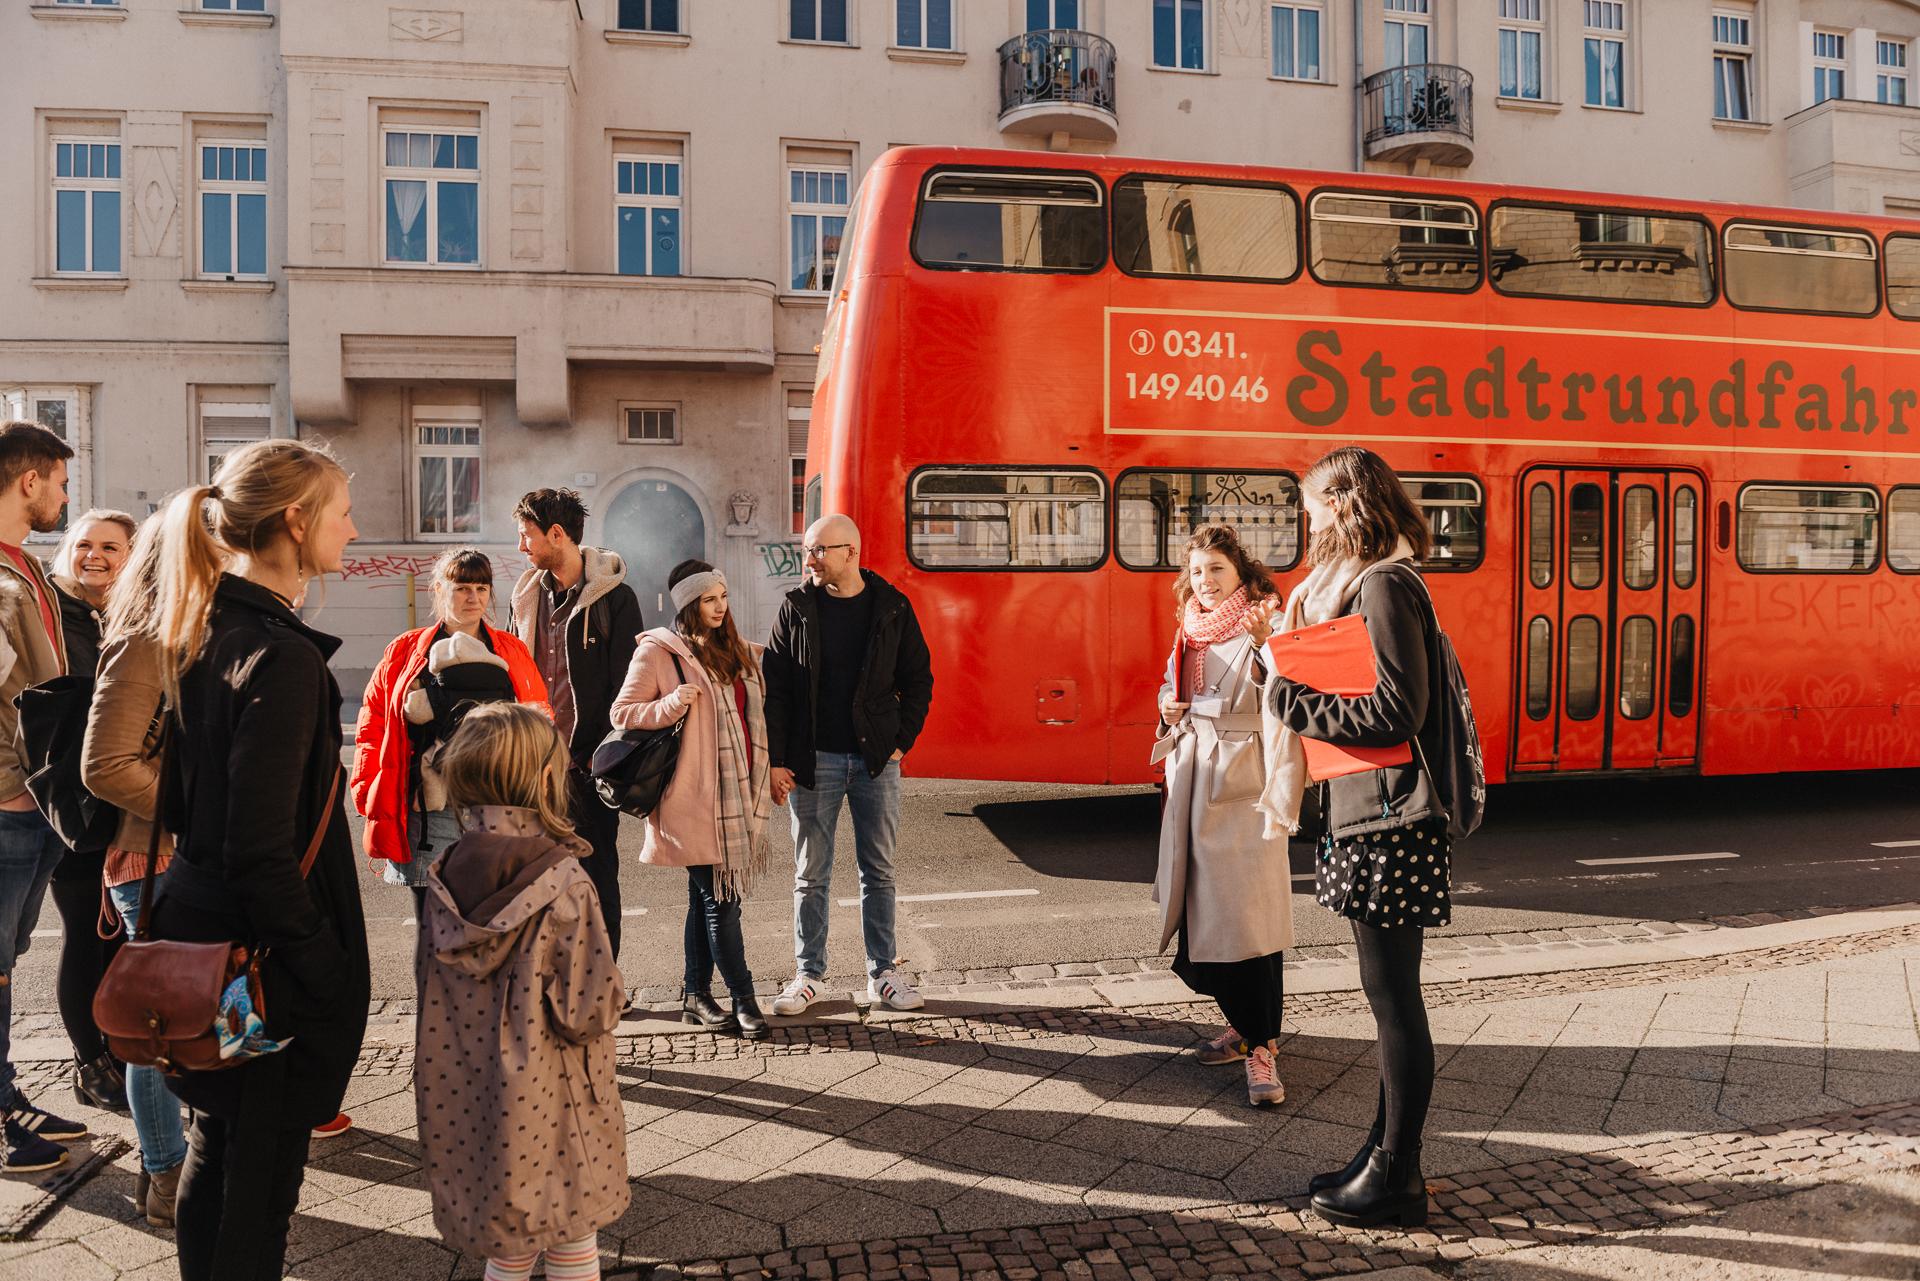 Zweinander-LeonoreHerzog-WeddingMarket-OnTour20191110-8657